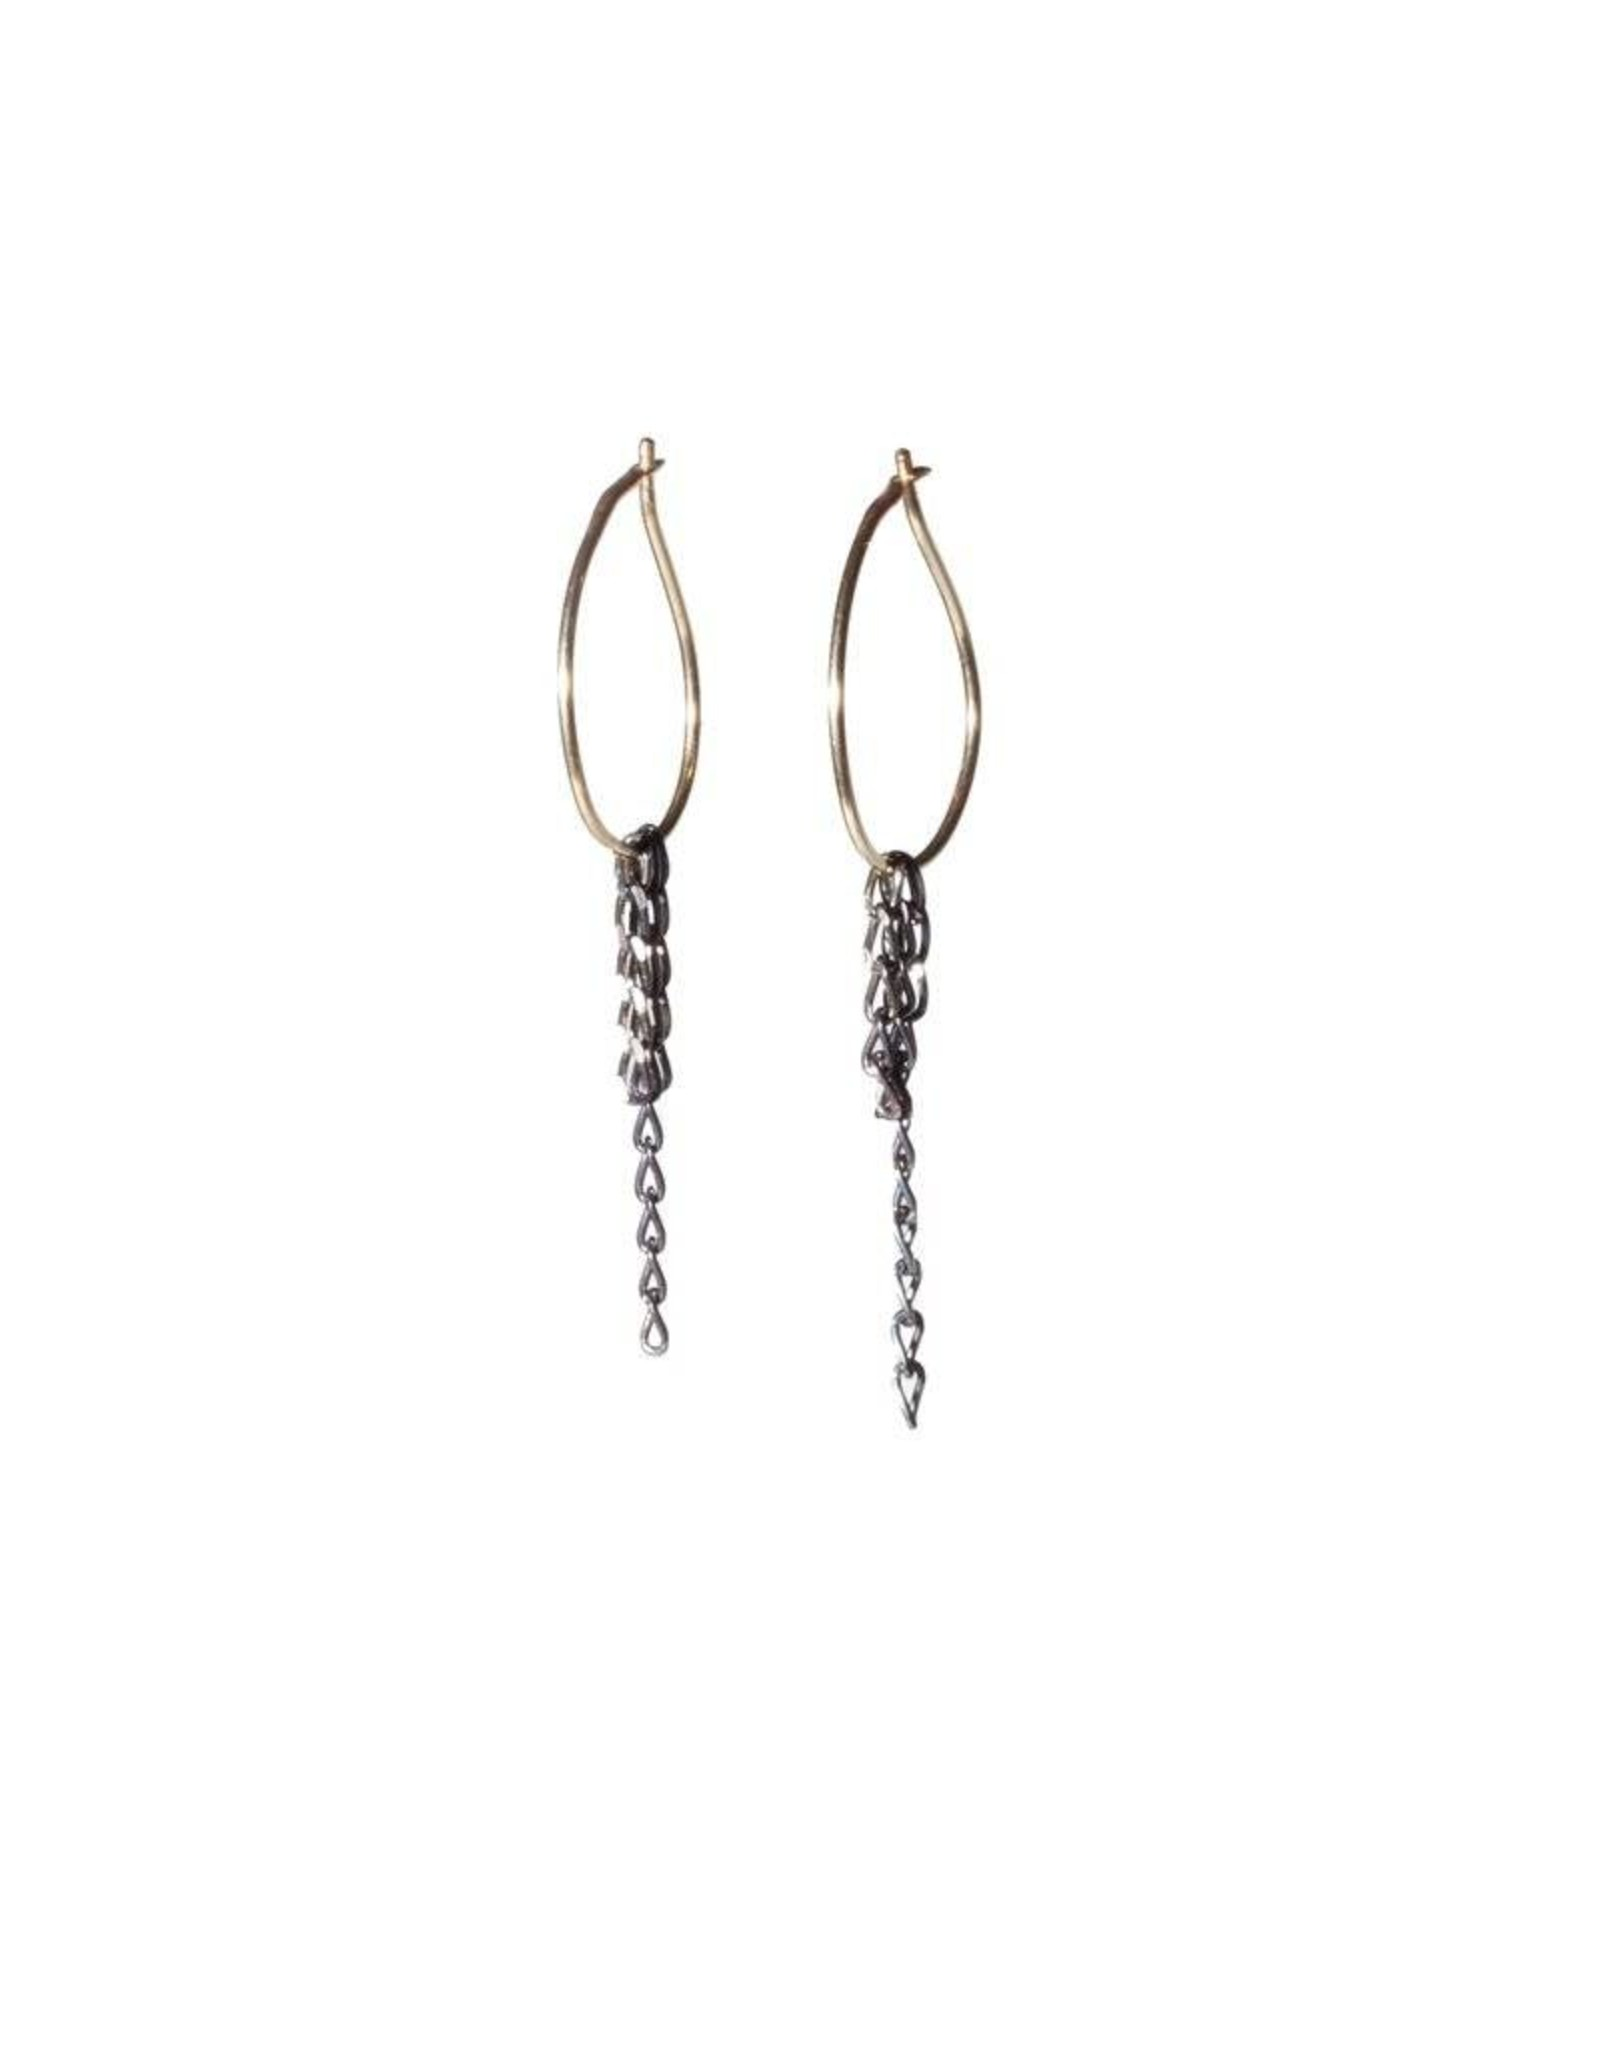 Chikahisa Studio Small Dangle Hoop Earrings